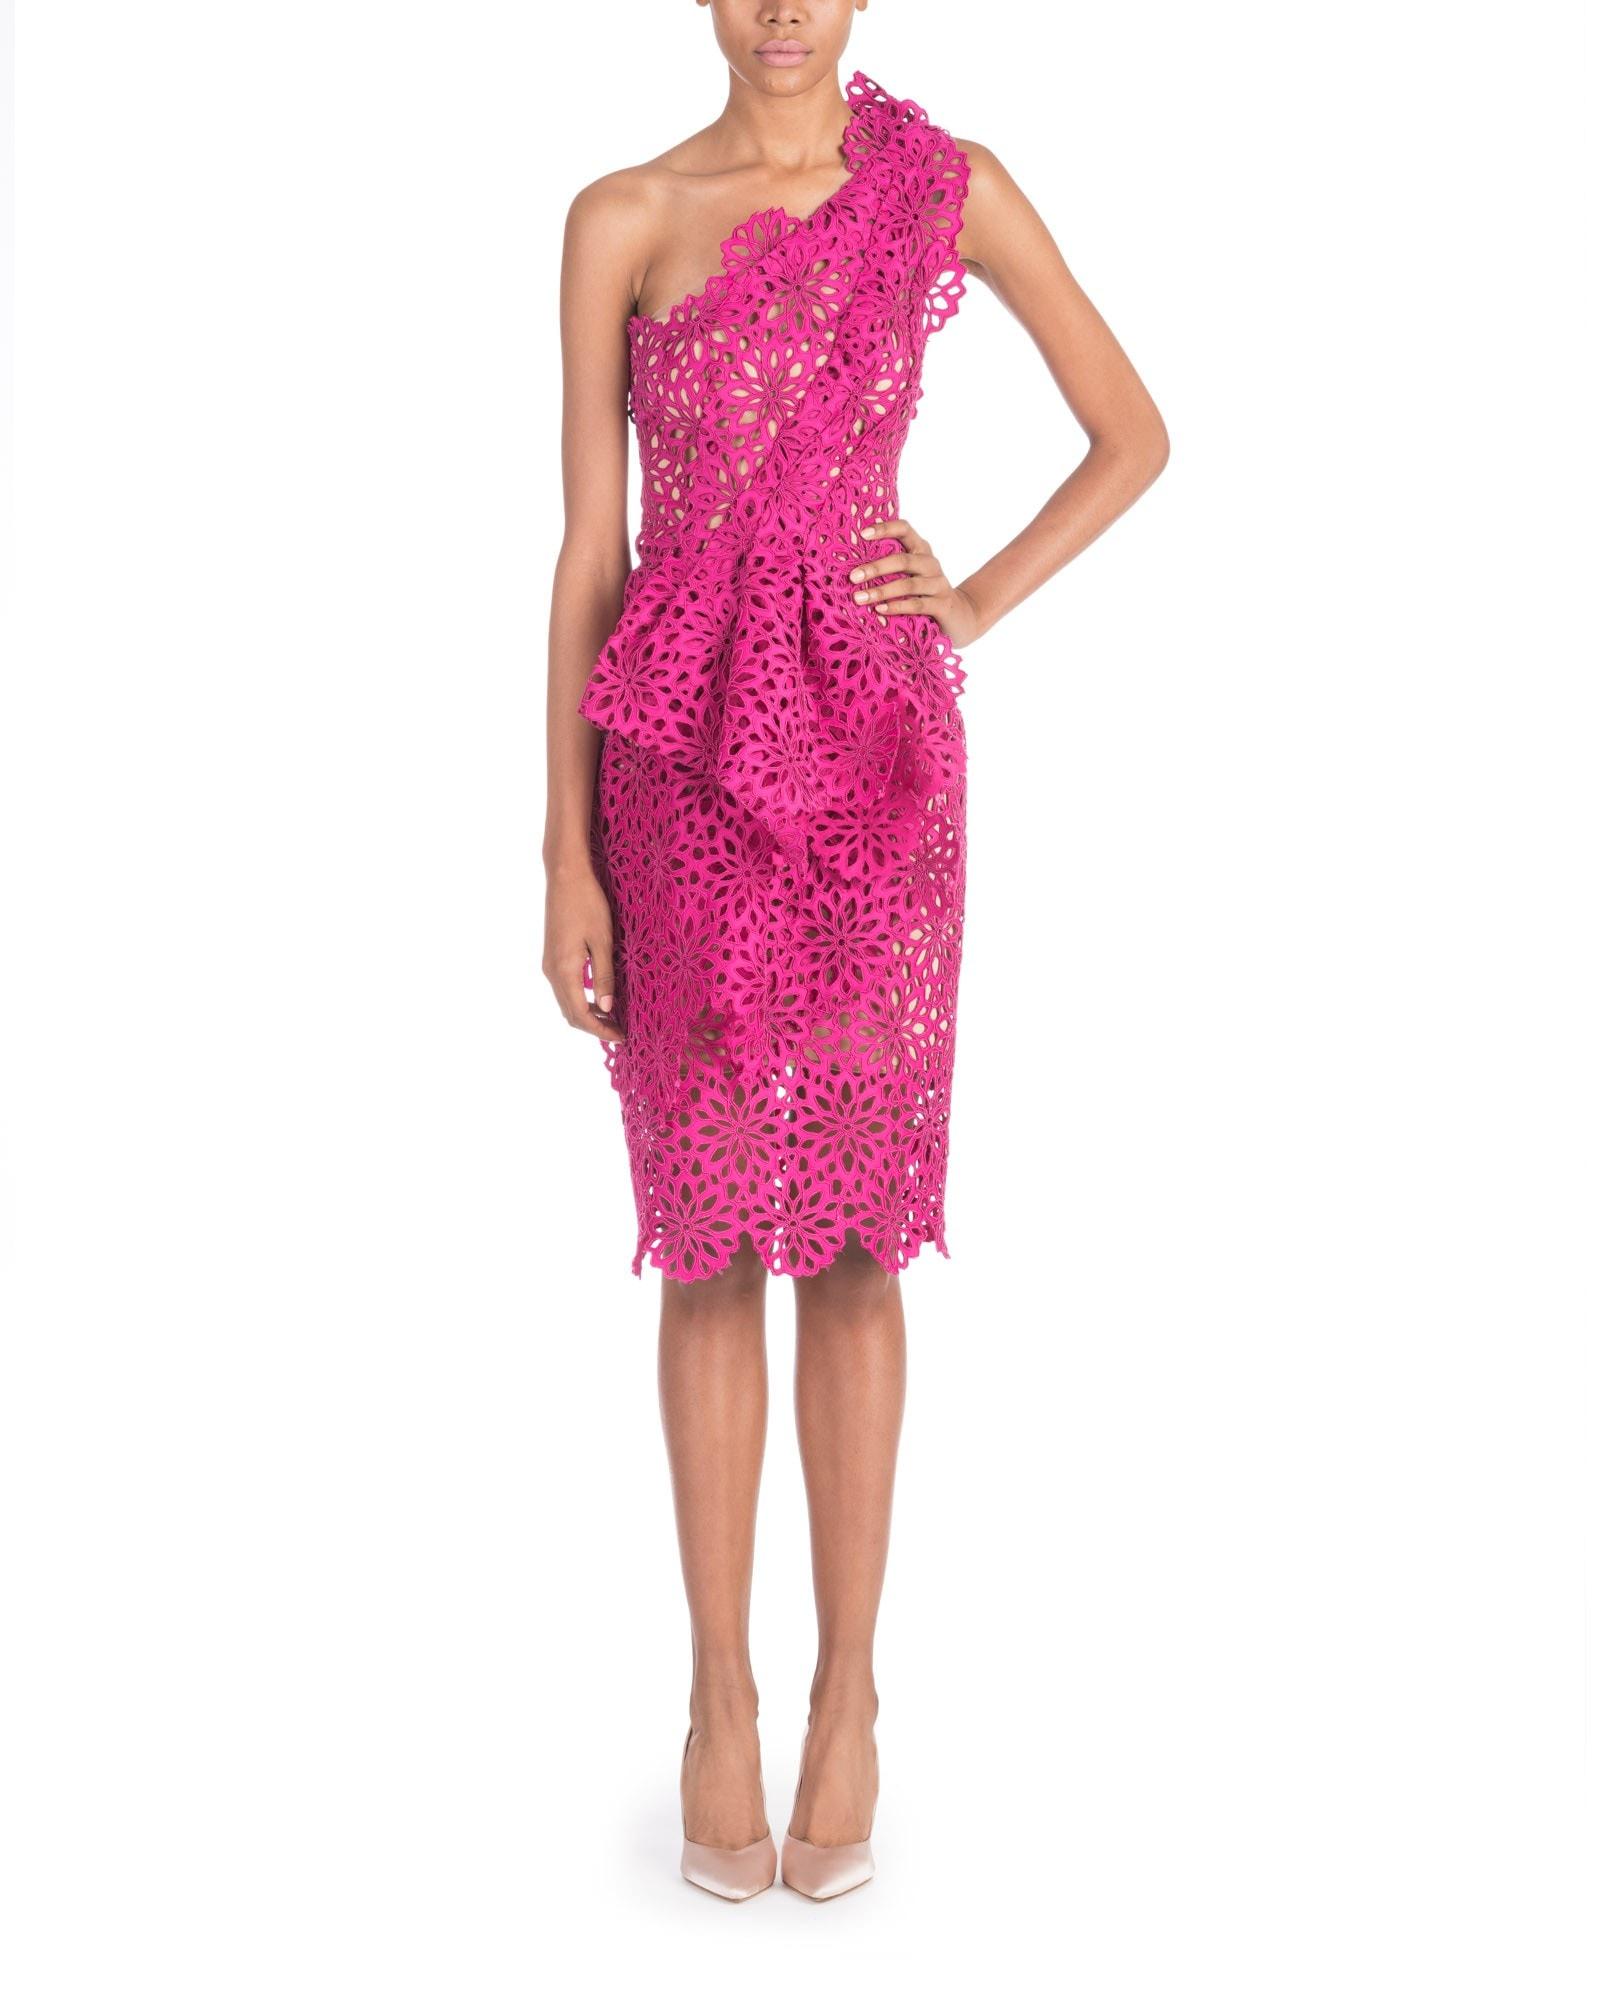 Fuchsia Cut Out Effect Dress